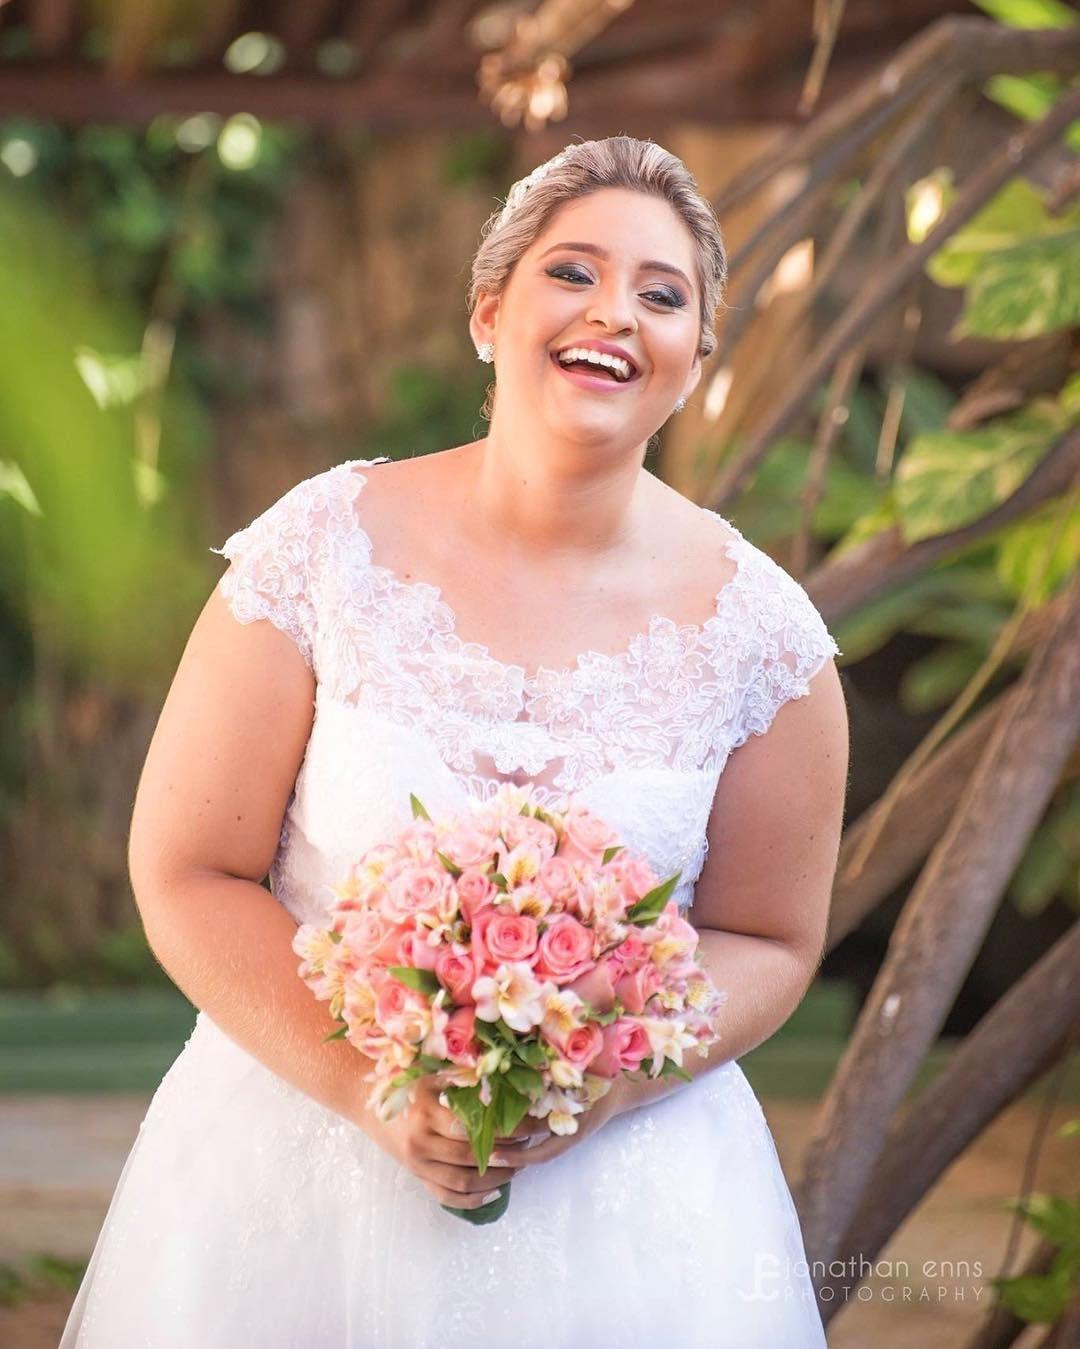 Lindo esse sorriso da Karine  #bride #justmarried #wedding #casamento #fotografodecasamento #weddingphotographer #fotografiadecasamento #weddingphotography #jonathanennsphototography http://gelinshop.com/ipost/1515998443024245206/?code=BUJ6I1EgWHW